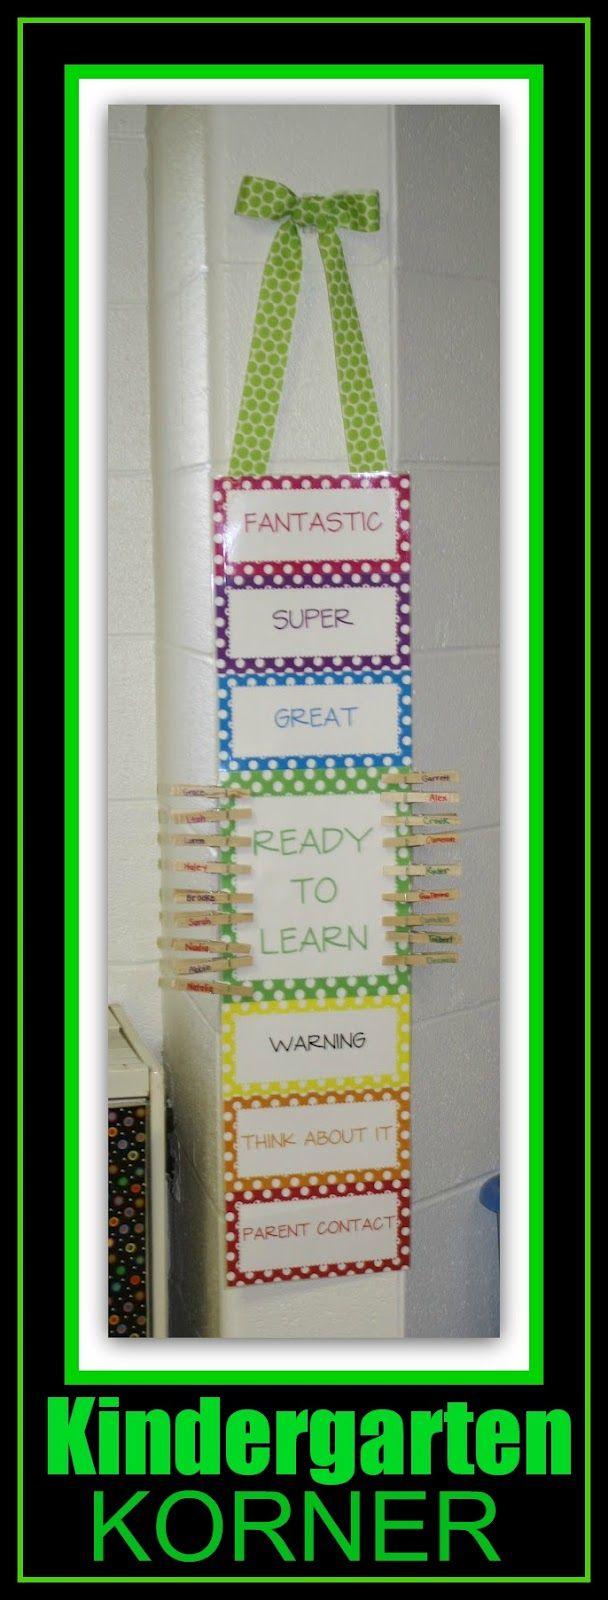 Vertical Behavior Chart from Kindergarten Korner (Behavior Chart RoundUP via RainbowsWithinReach)